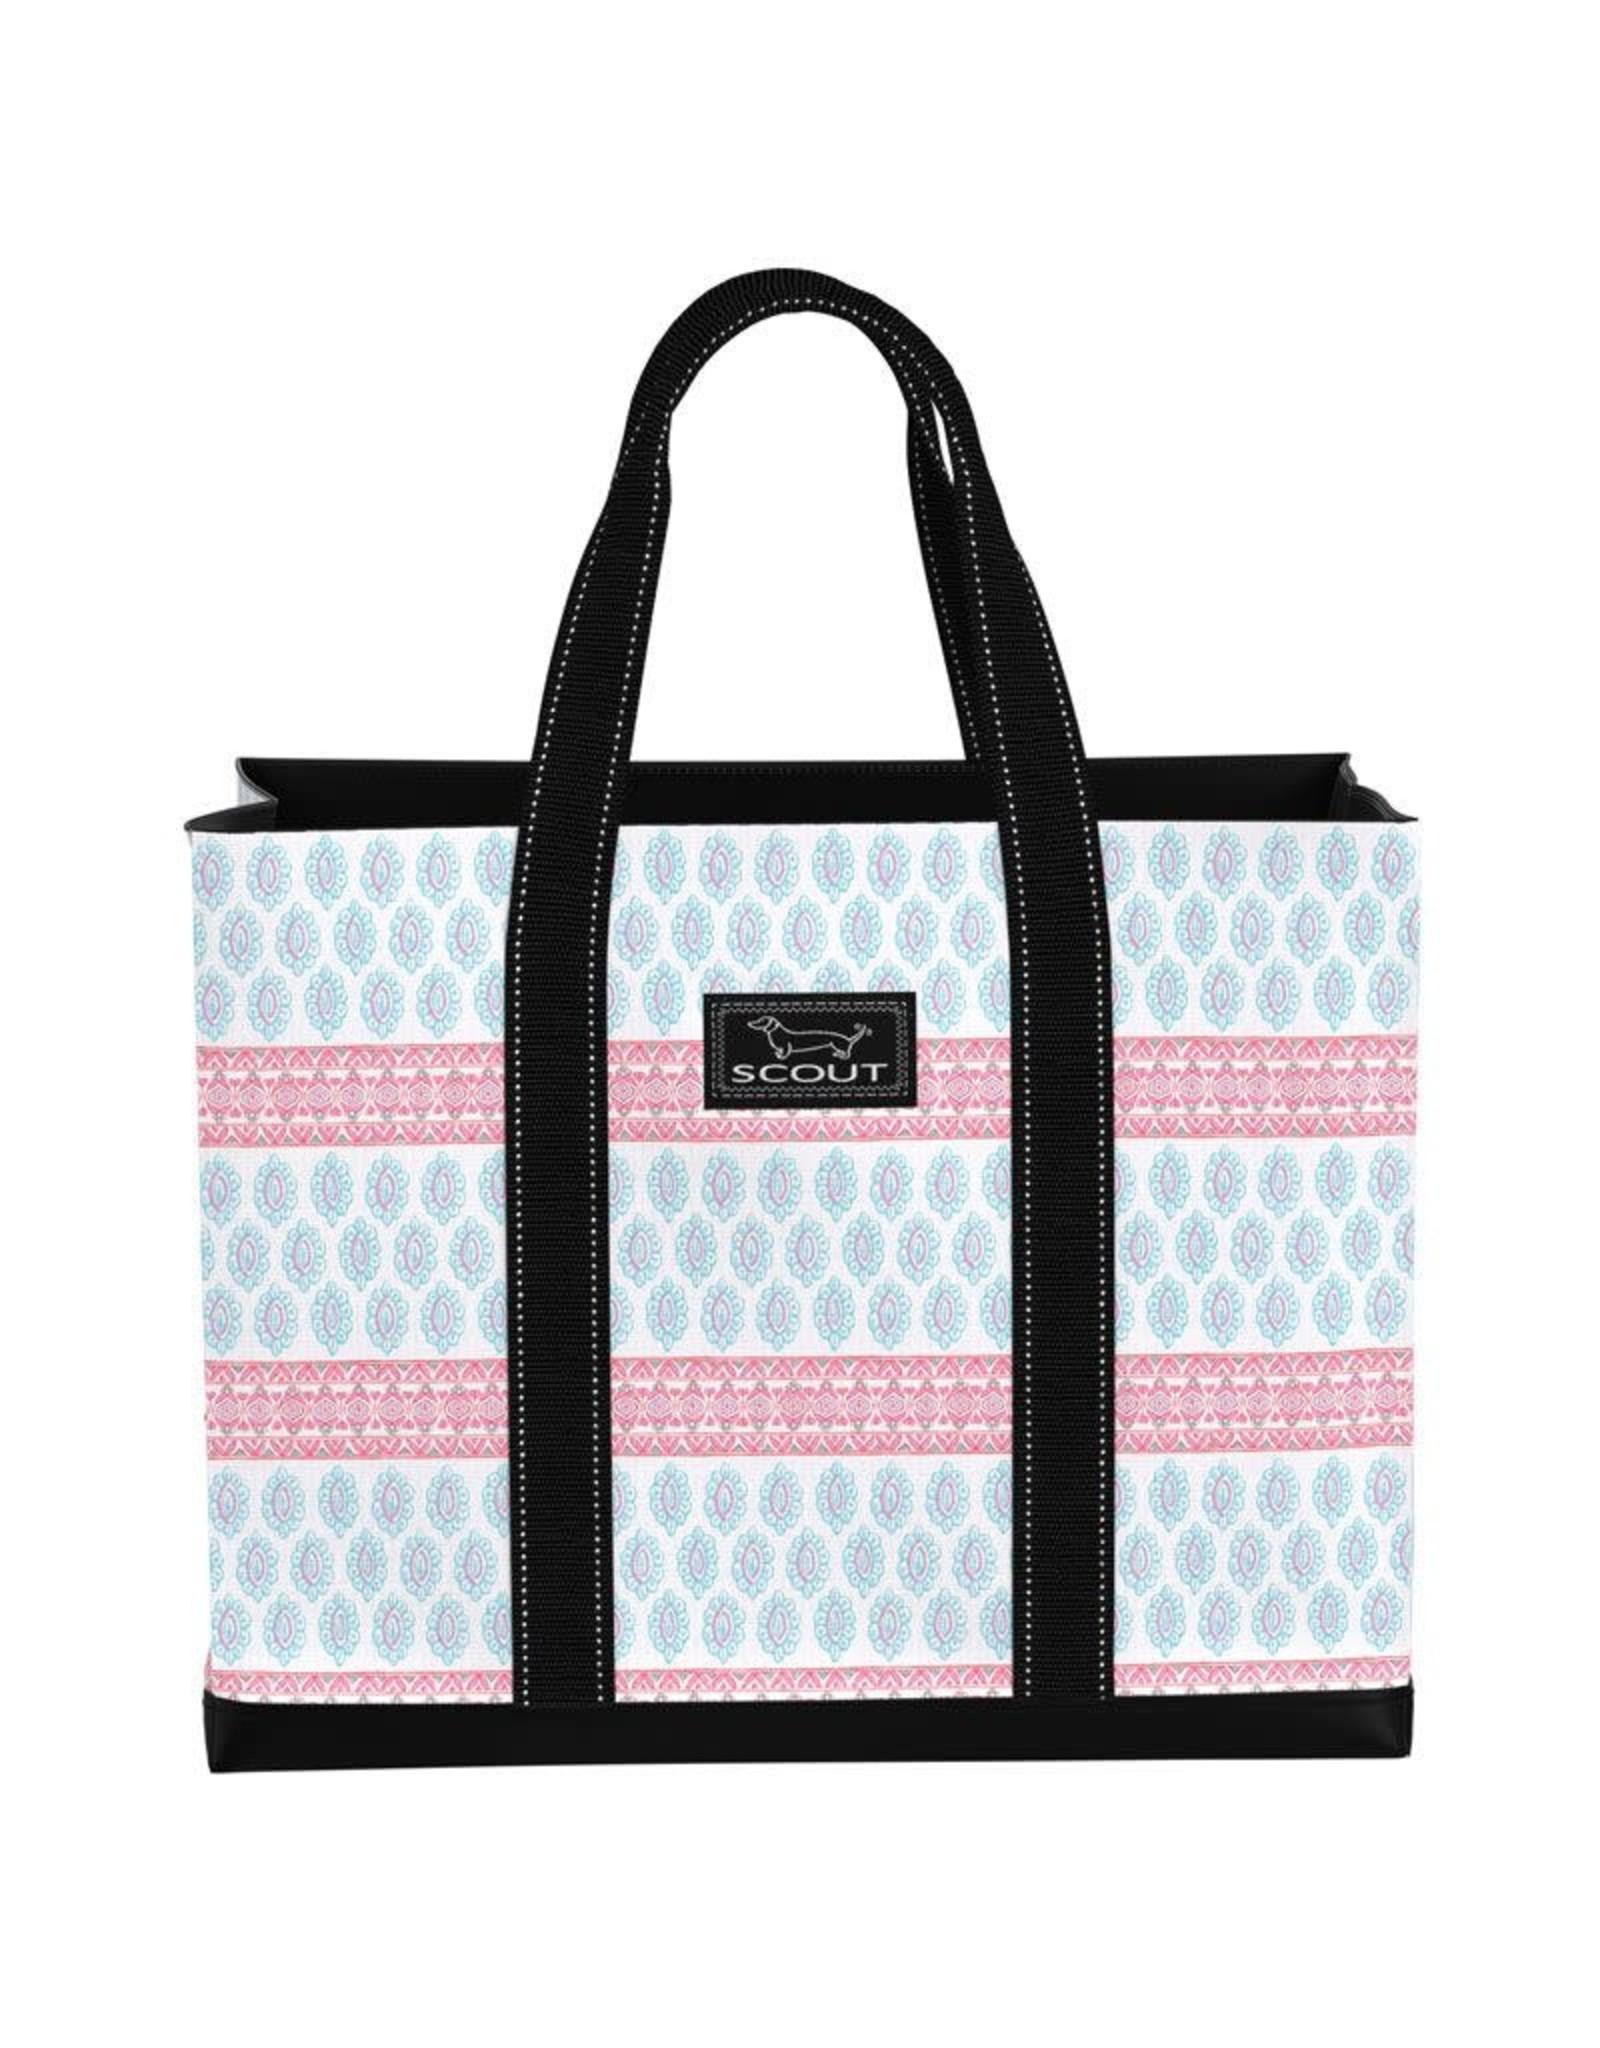 Scout Bags Alexis Rose Original Deano Tote Bag